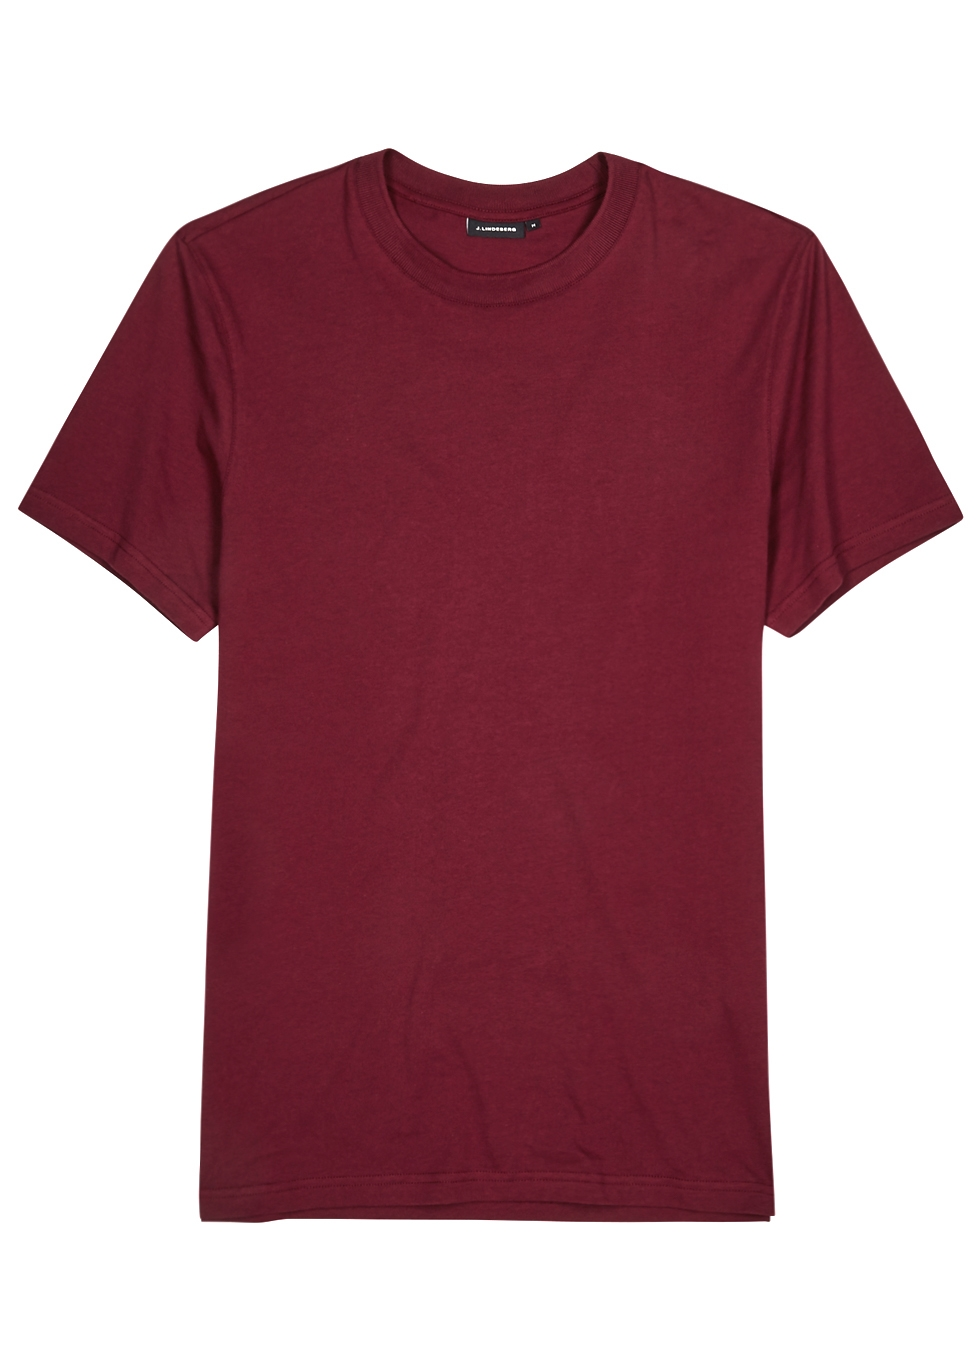 J. LINDEBERG | J.Lindeberg Silo Burgundy Cotton T-shirt | Goxip